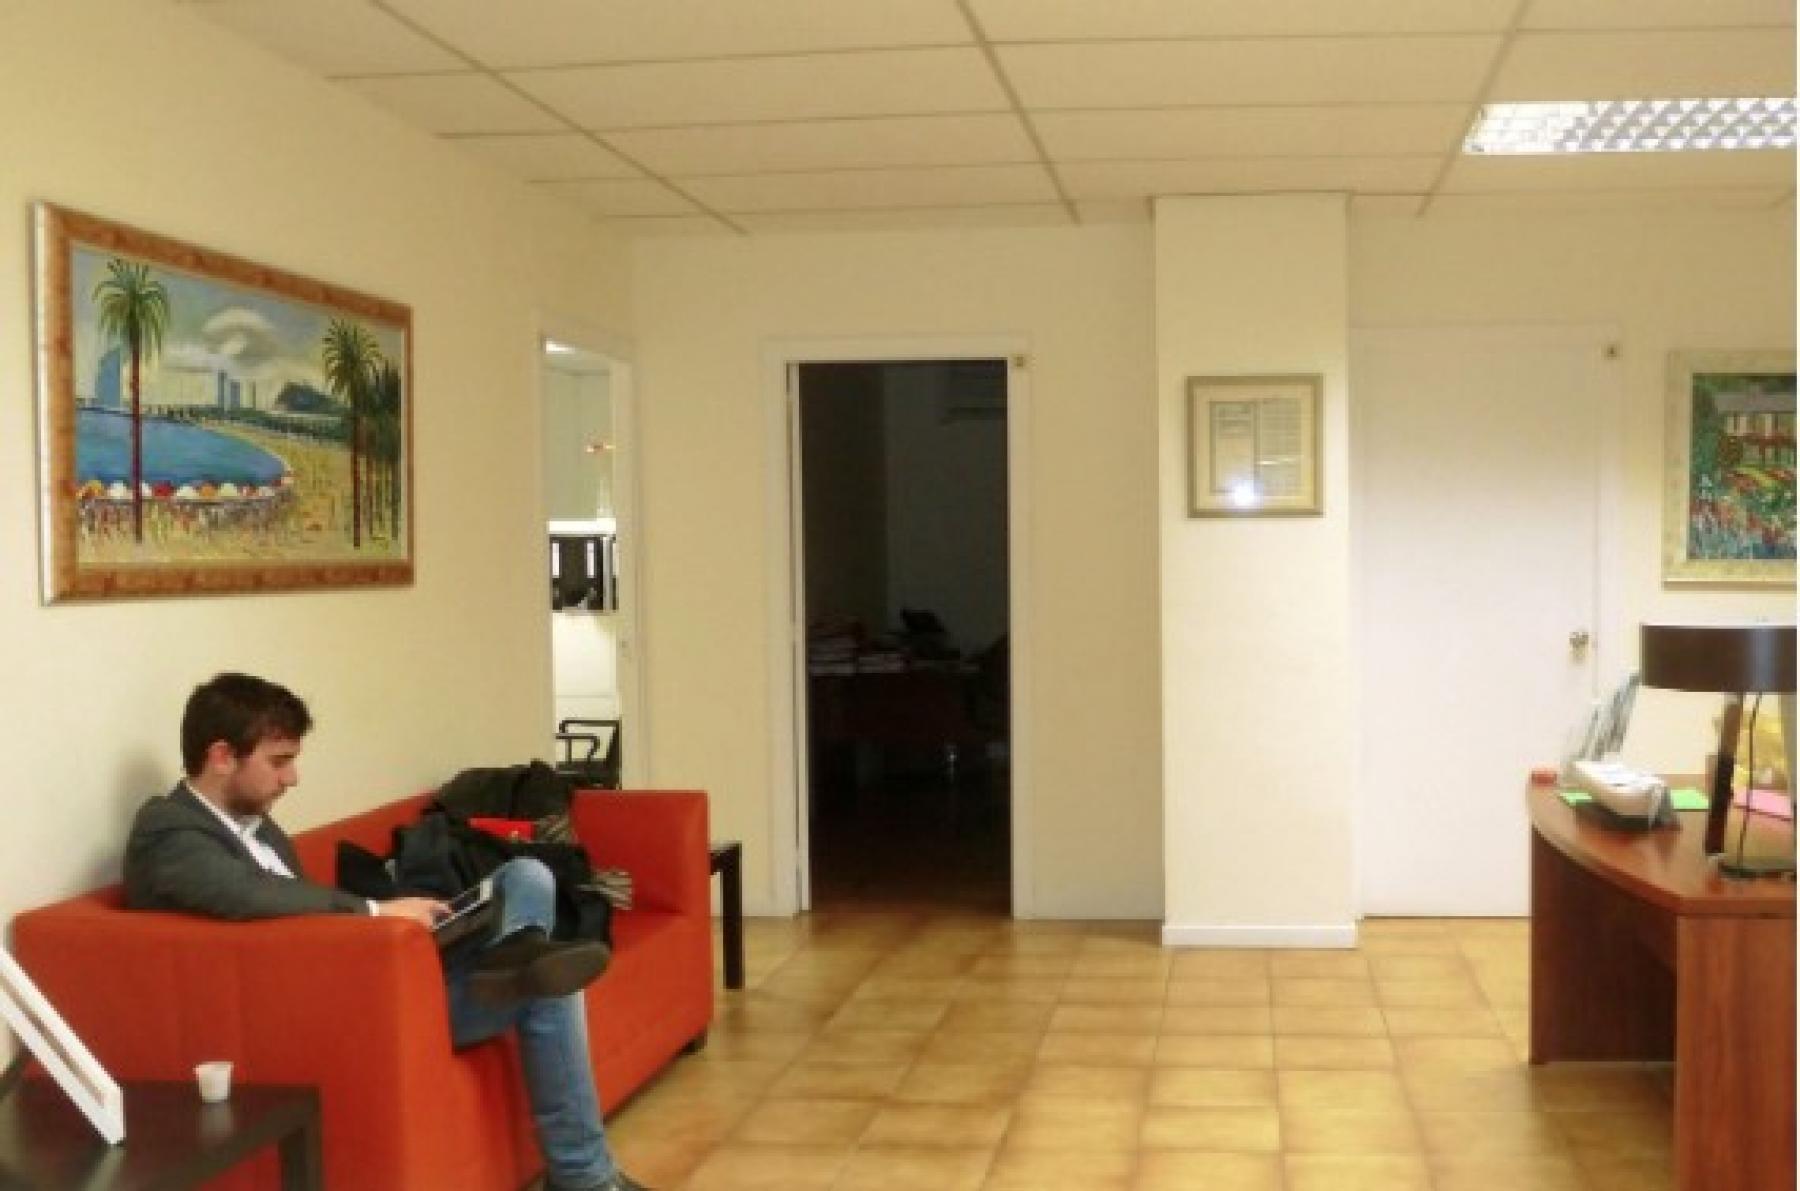 Alquilar oficinas Rambla del Brasil 28-30, Barcelona (6)